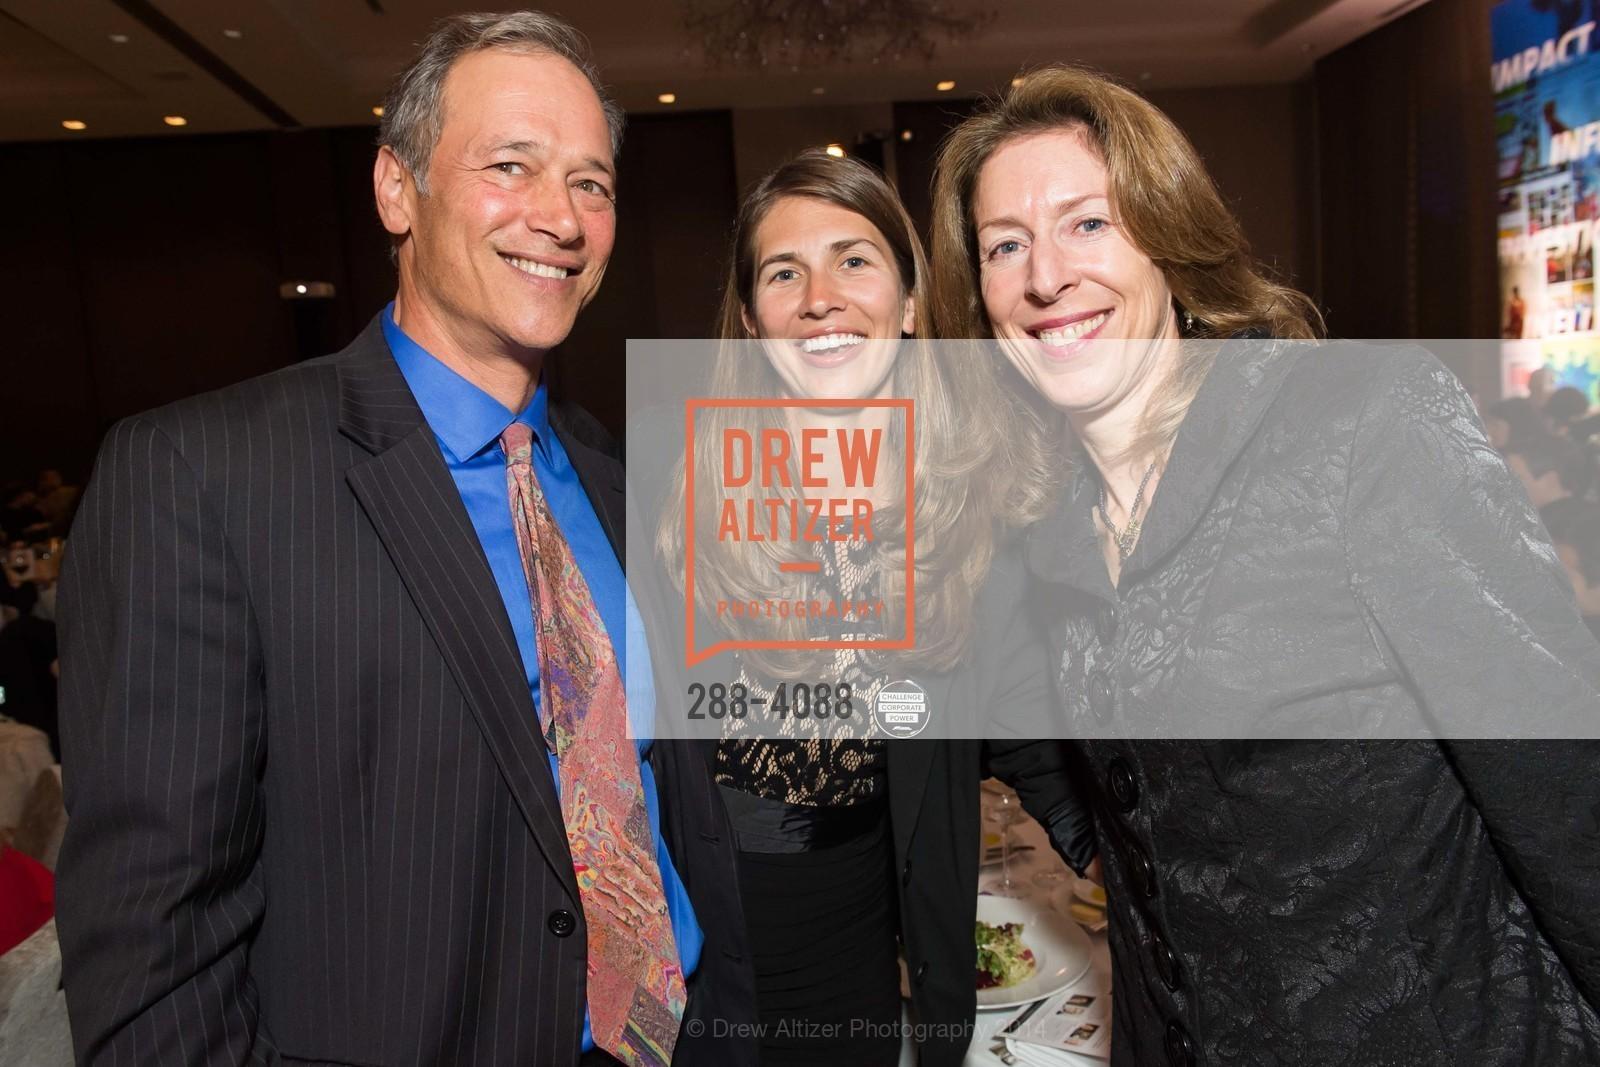 Steve Moazee, Lindsey Allen, Kimberly Hughes Moazee, Photo #288-4088